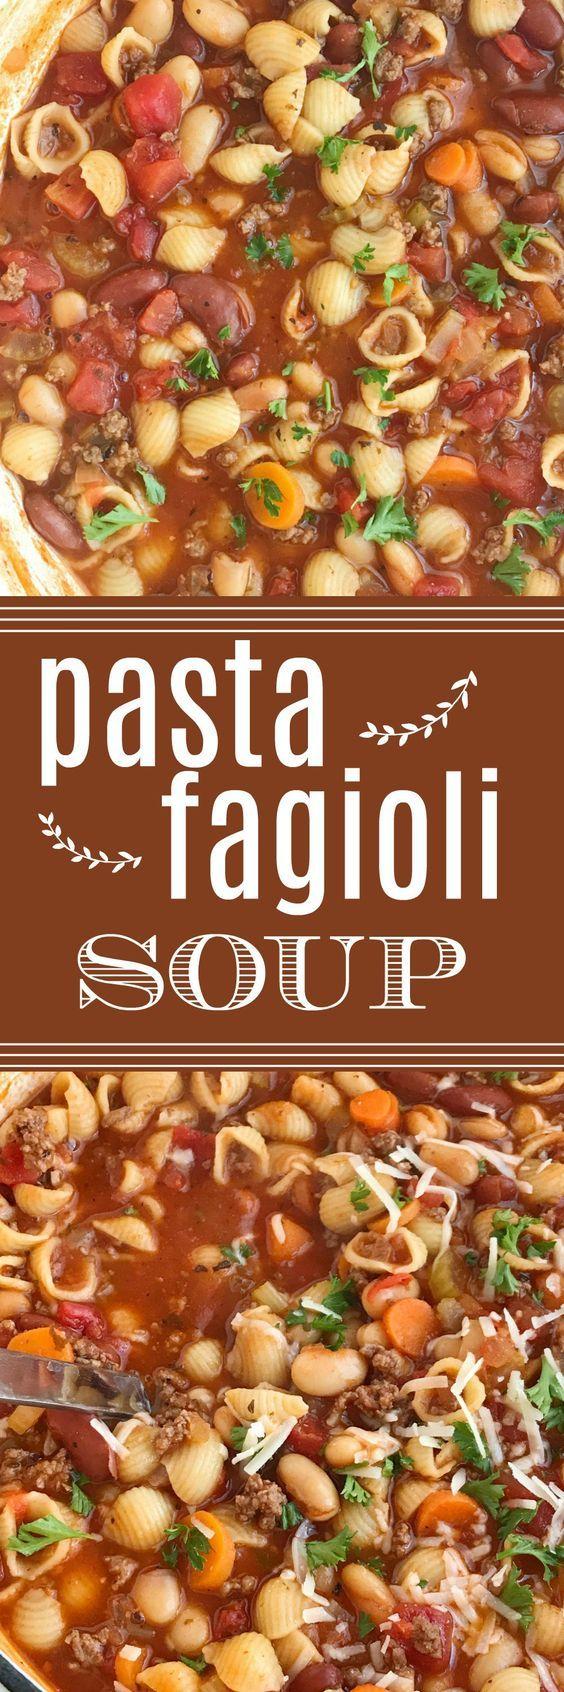 Pasta Fagioli Soup   Olive Garden Copycat Fagioli Soup   Soup   One Pot   Soup Recipes   Together as Family #souprecipes #recipeoftheday #pastafagiolisoup #pastafagiolisouprecipes